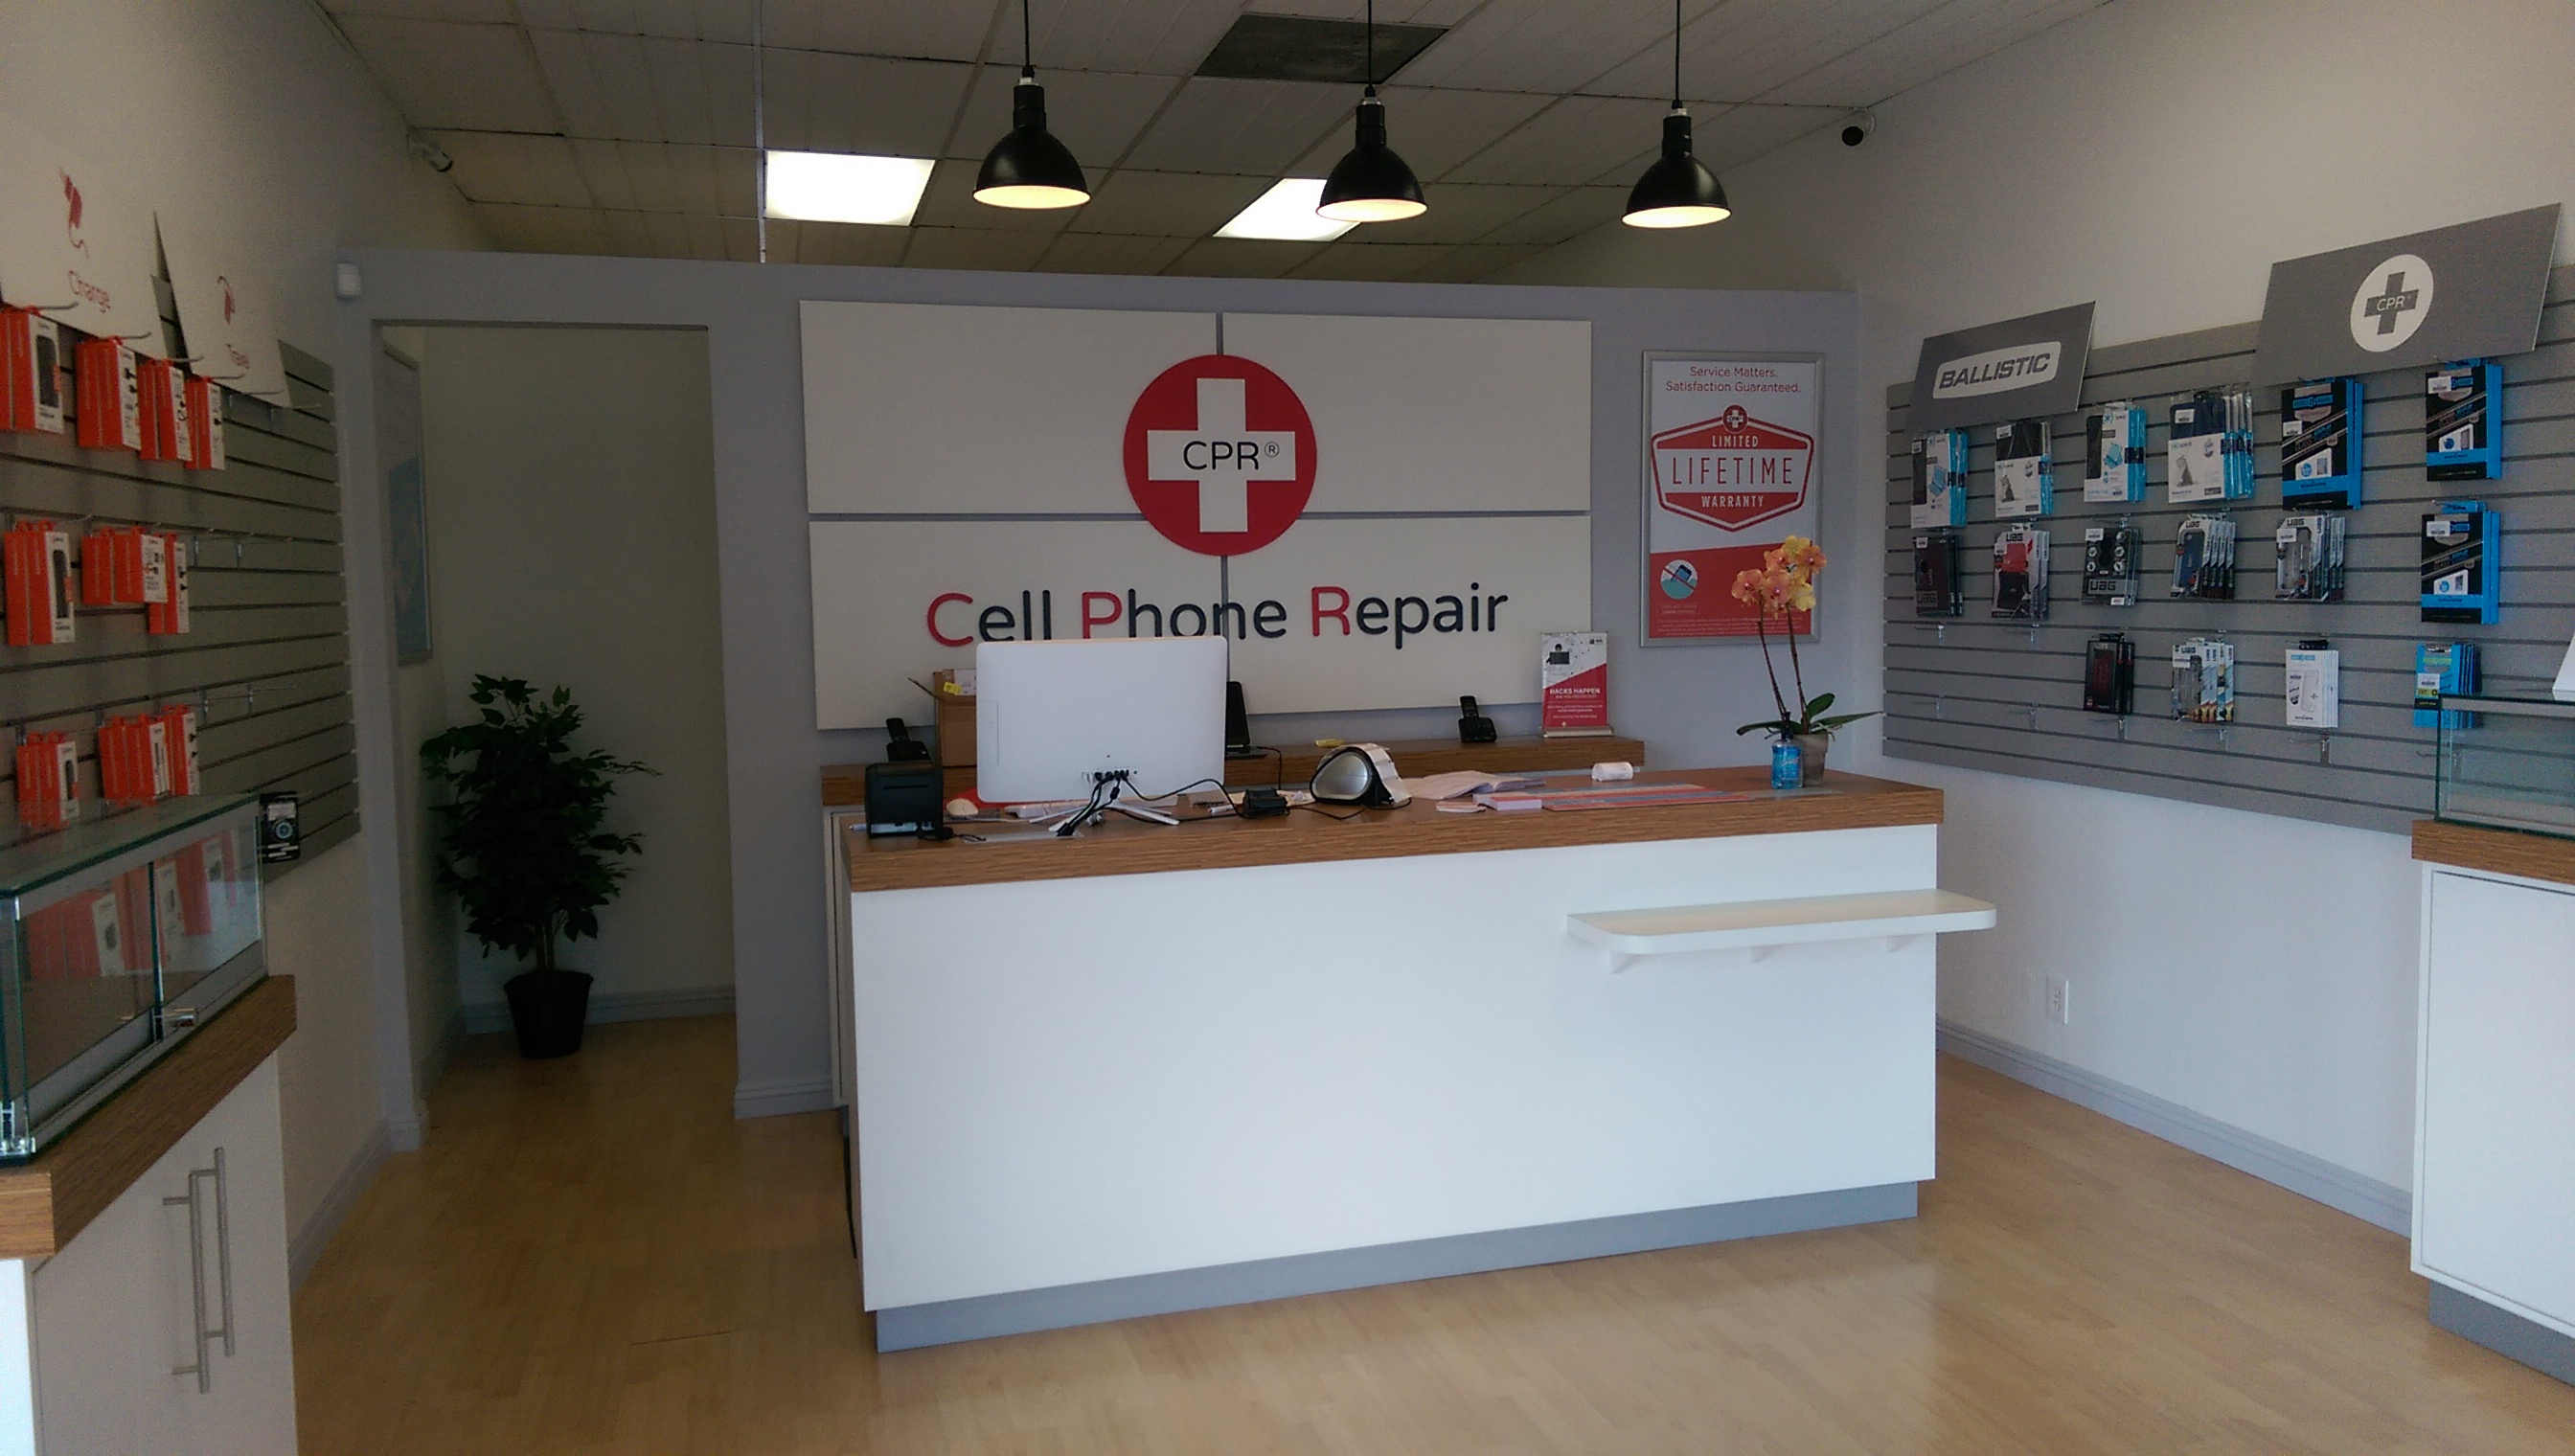 CPR Cell Phone Repair Poway image 1